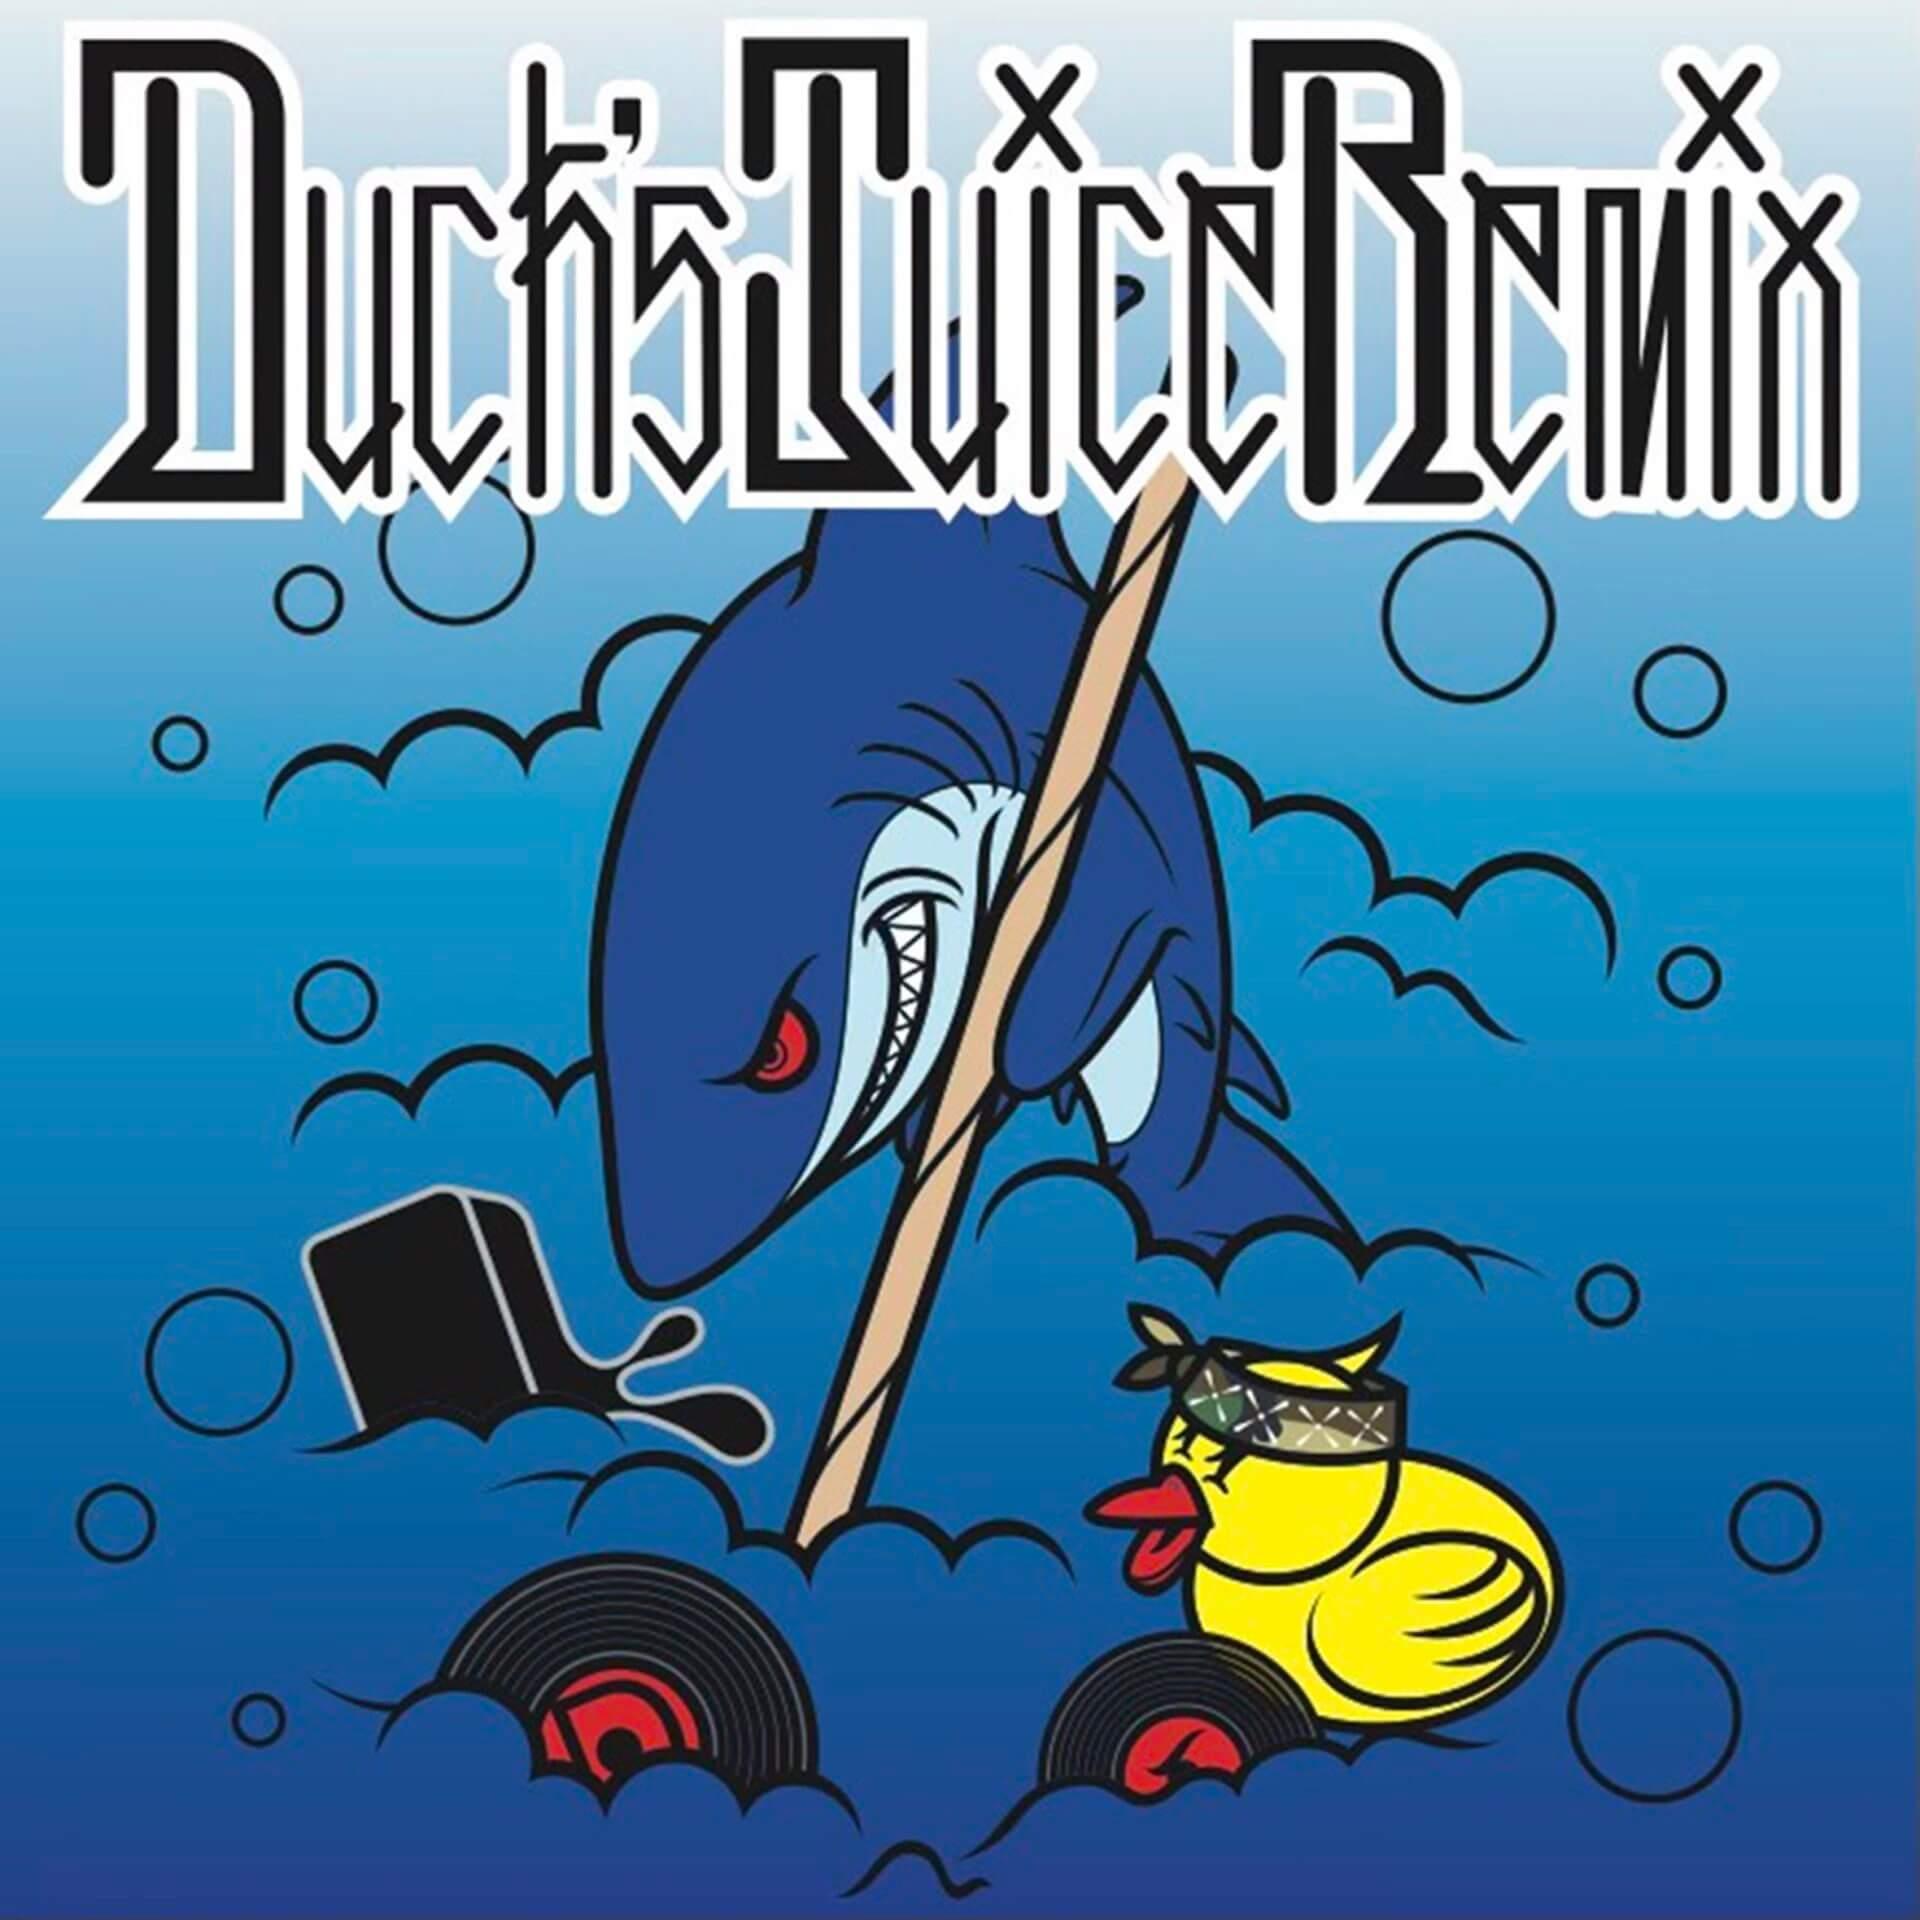 SHEEF THE 3RDの楽曲をKILLAH SHARKがリミックスした『Duck's Juice Remix』がリリース決定! music210914_sheef_the_3rd_1